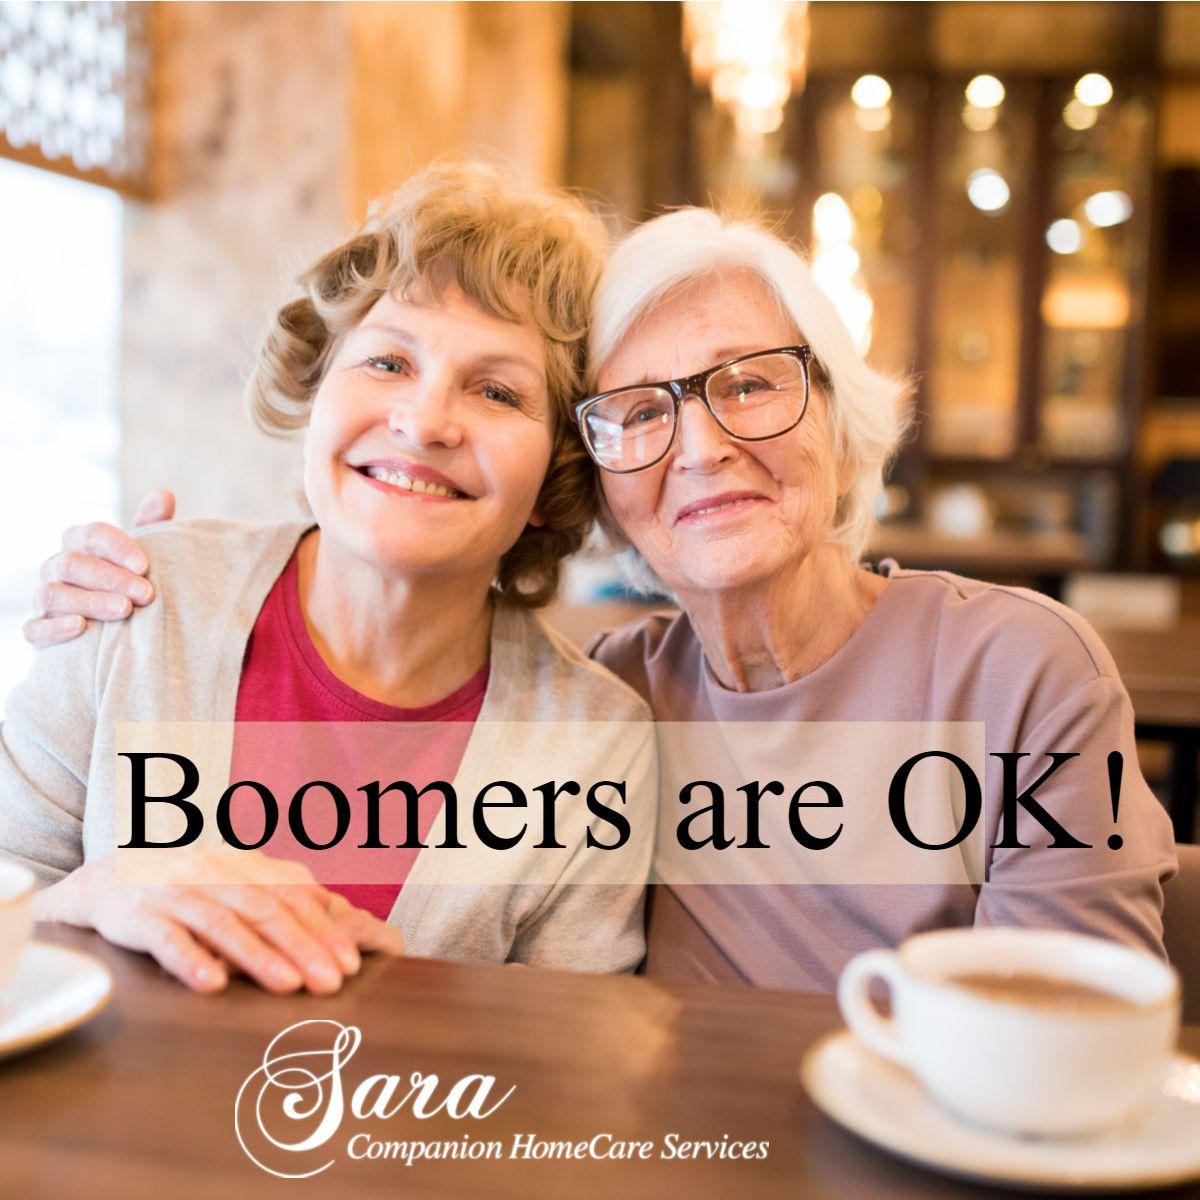 OK Boomer has a catch term to criticize the